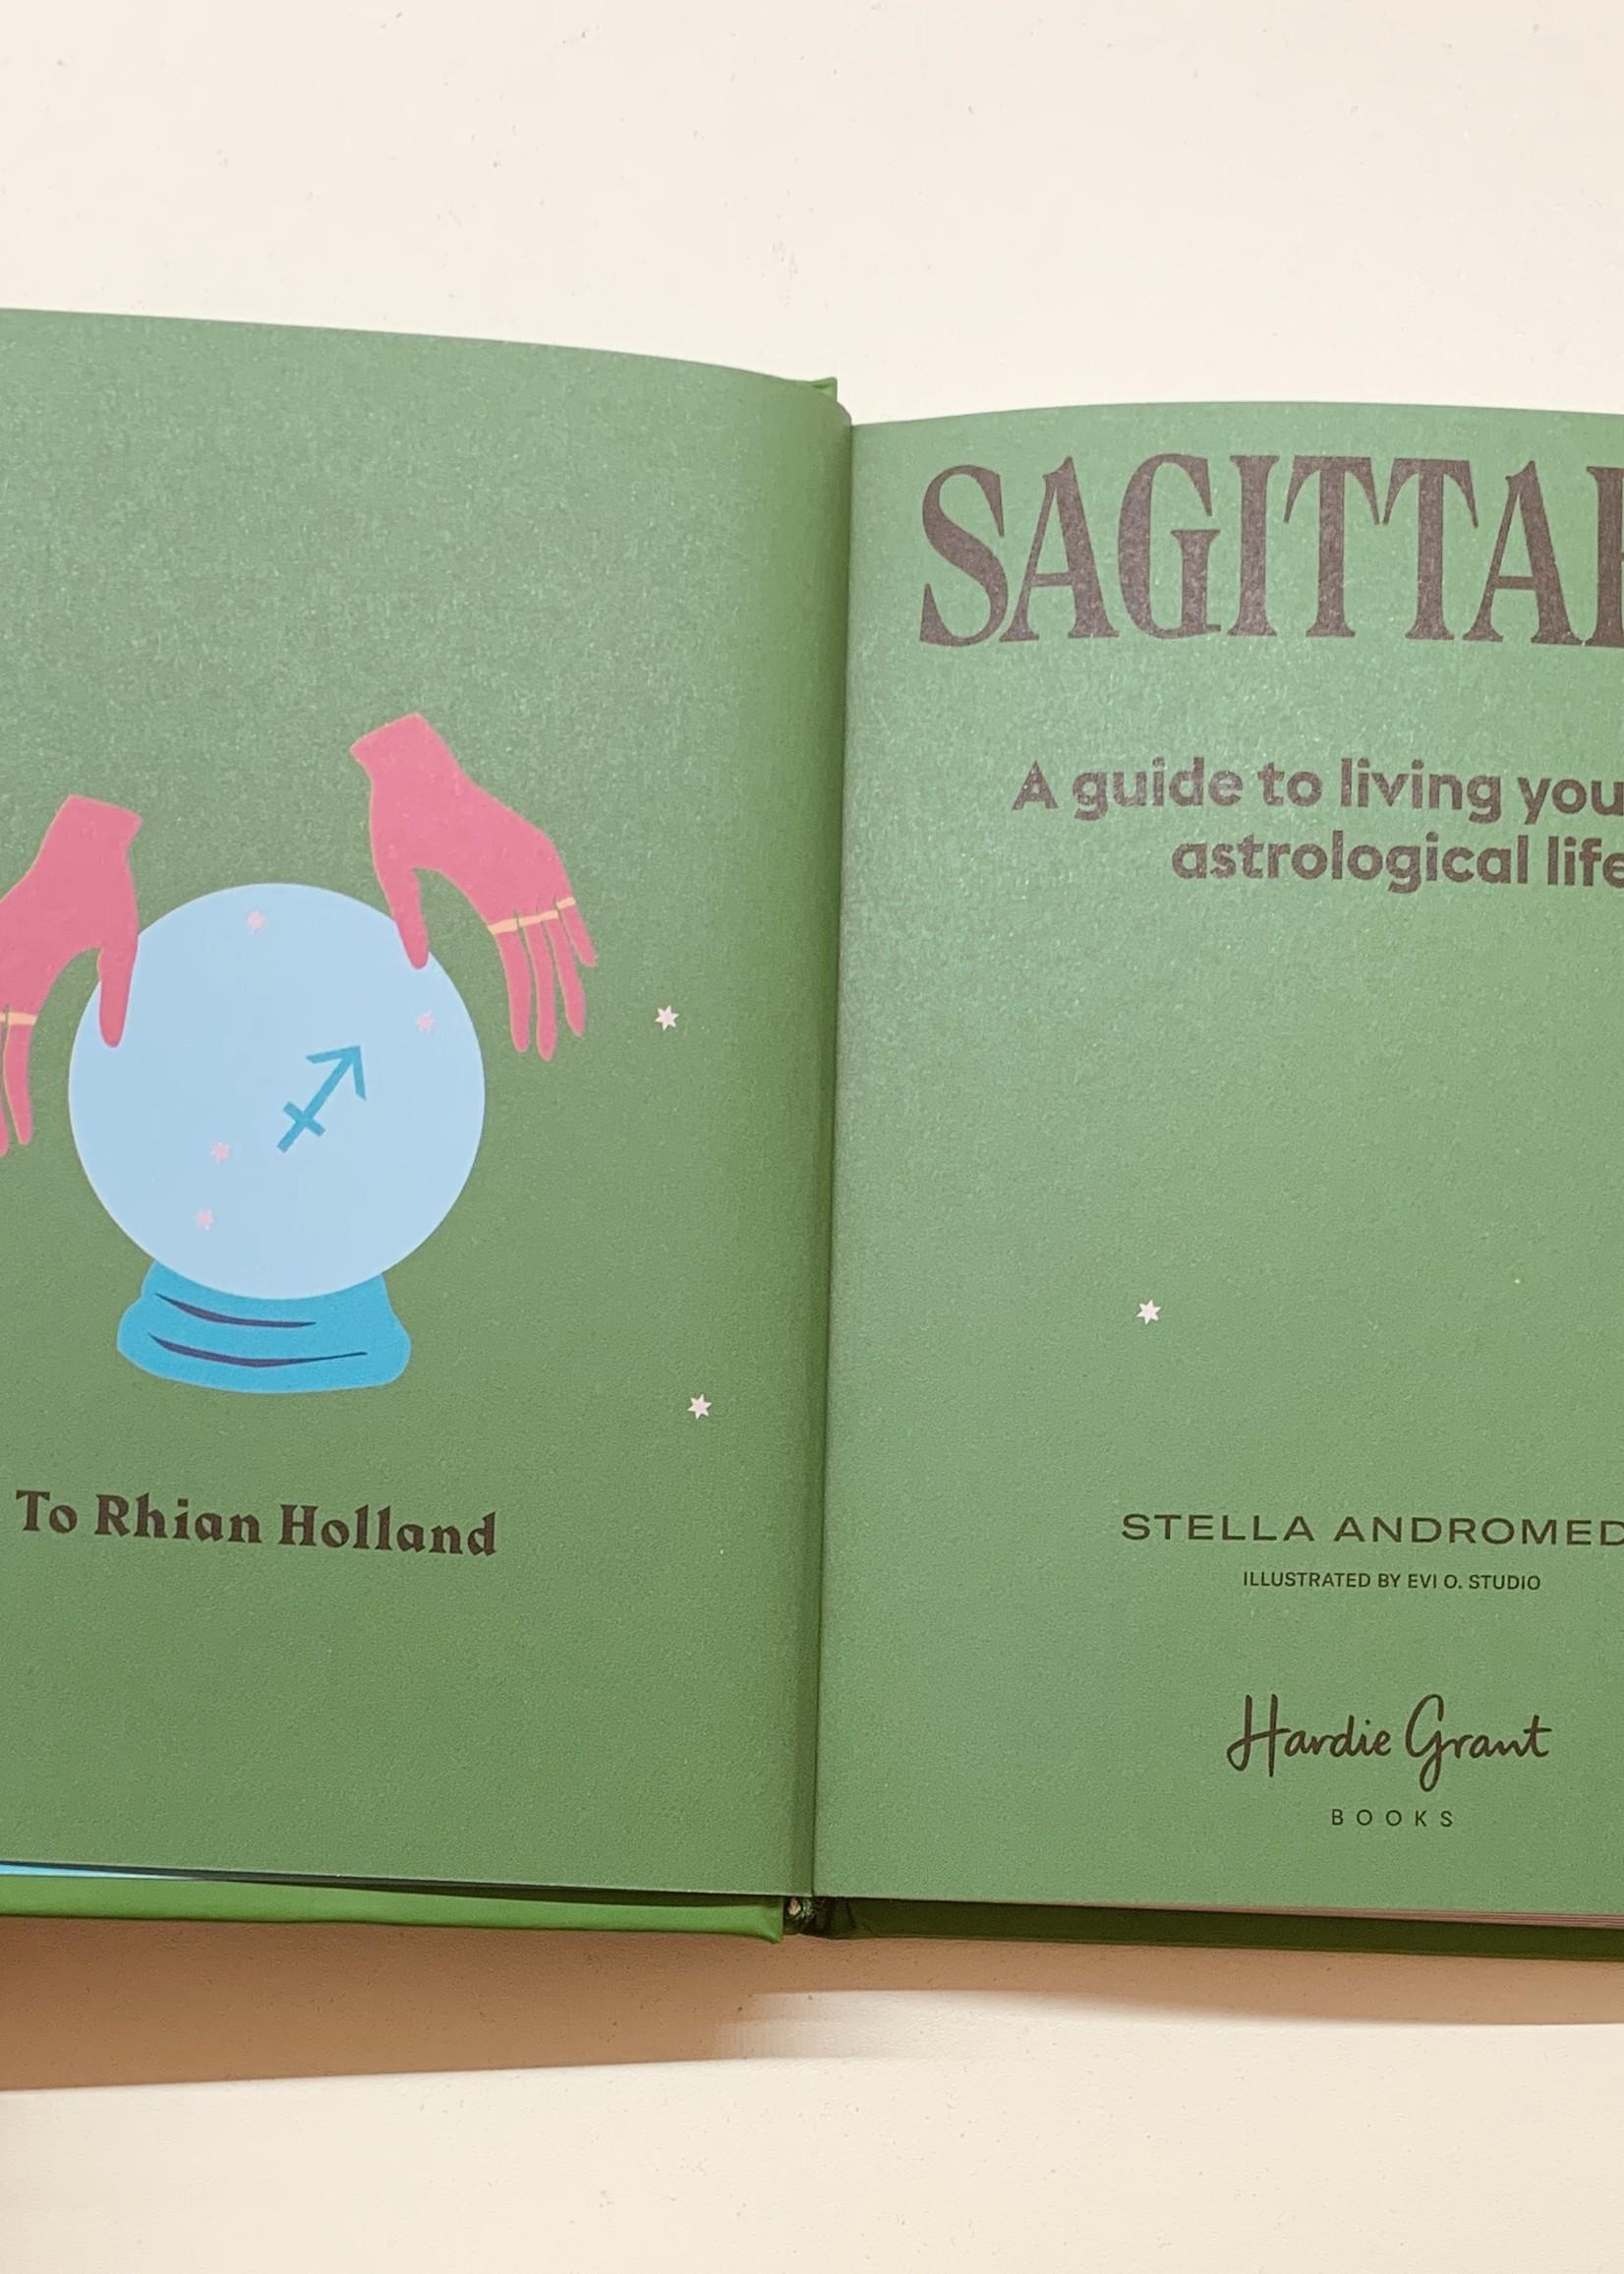 hachette book group hachette sagittarius book